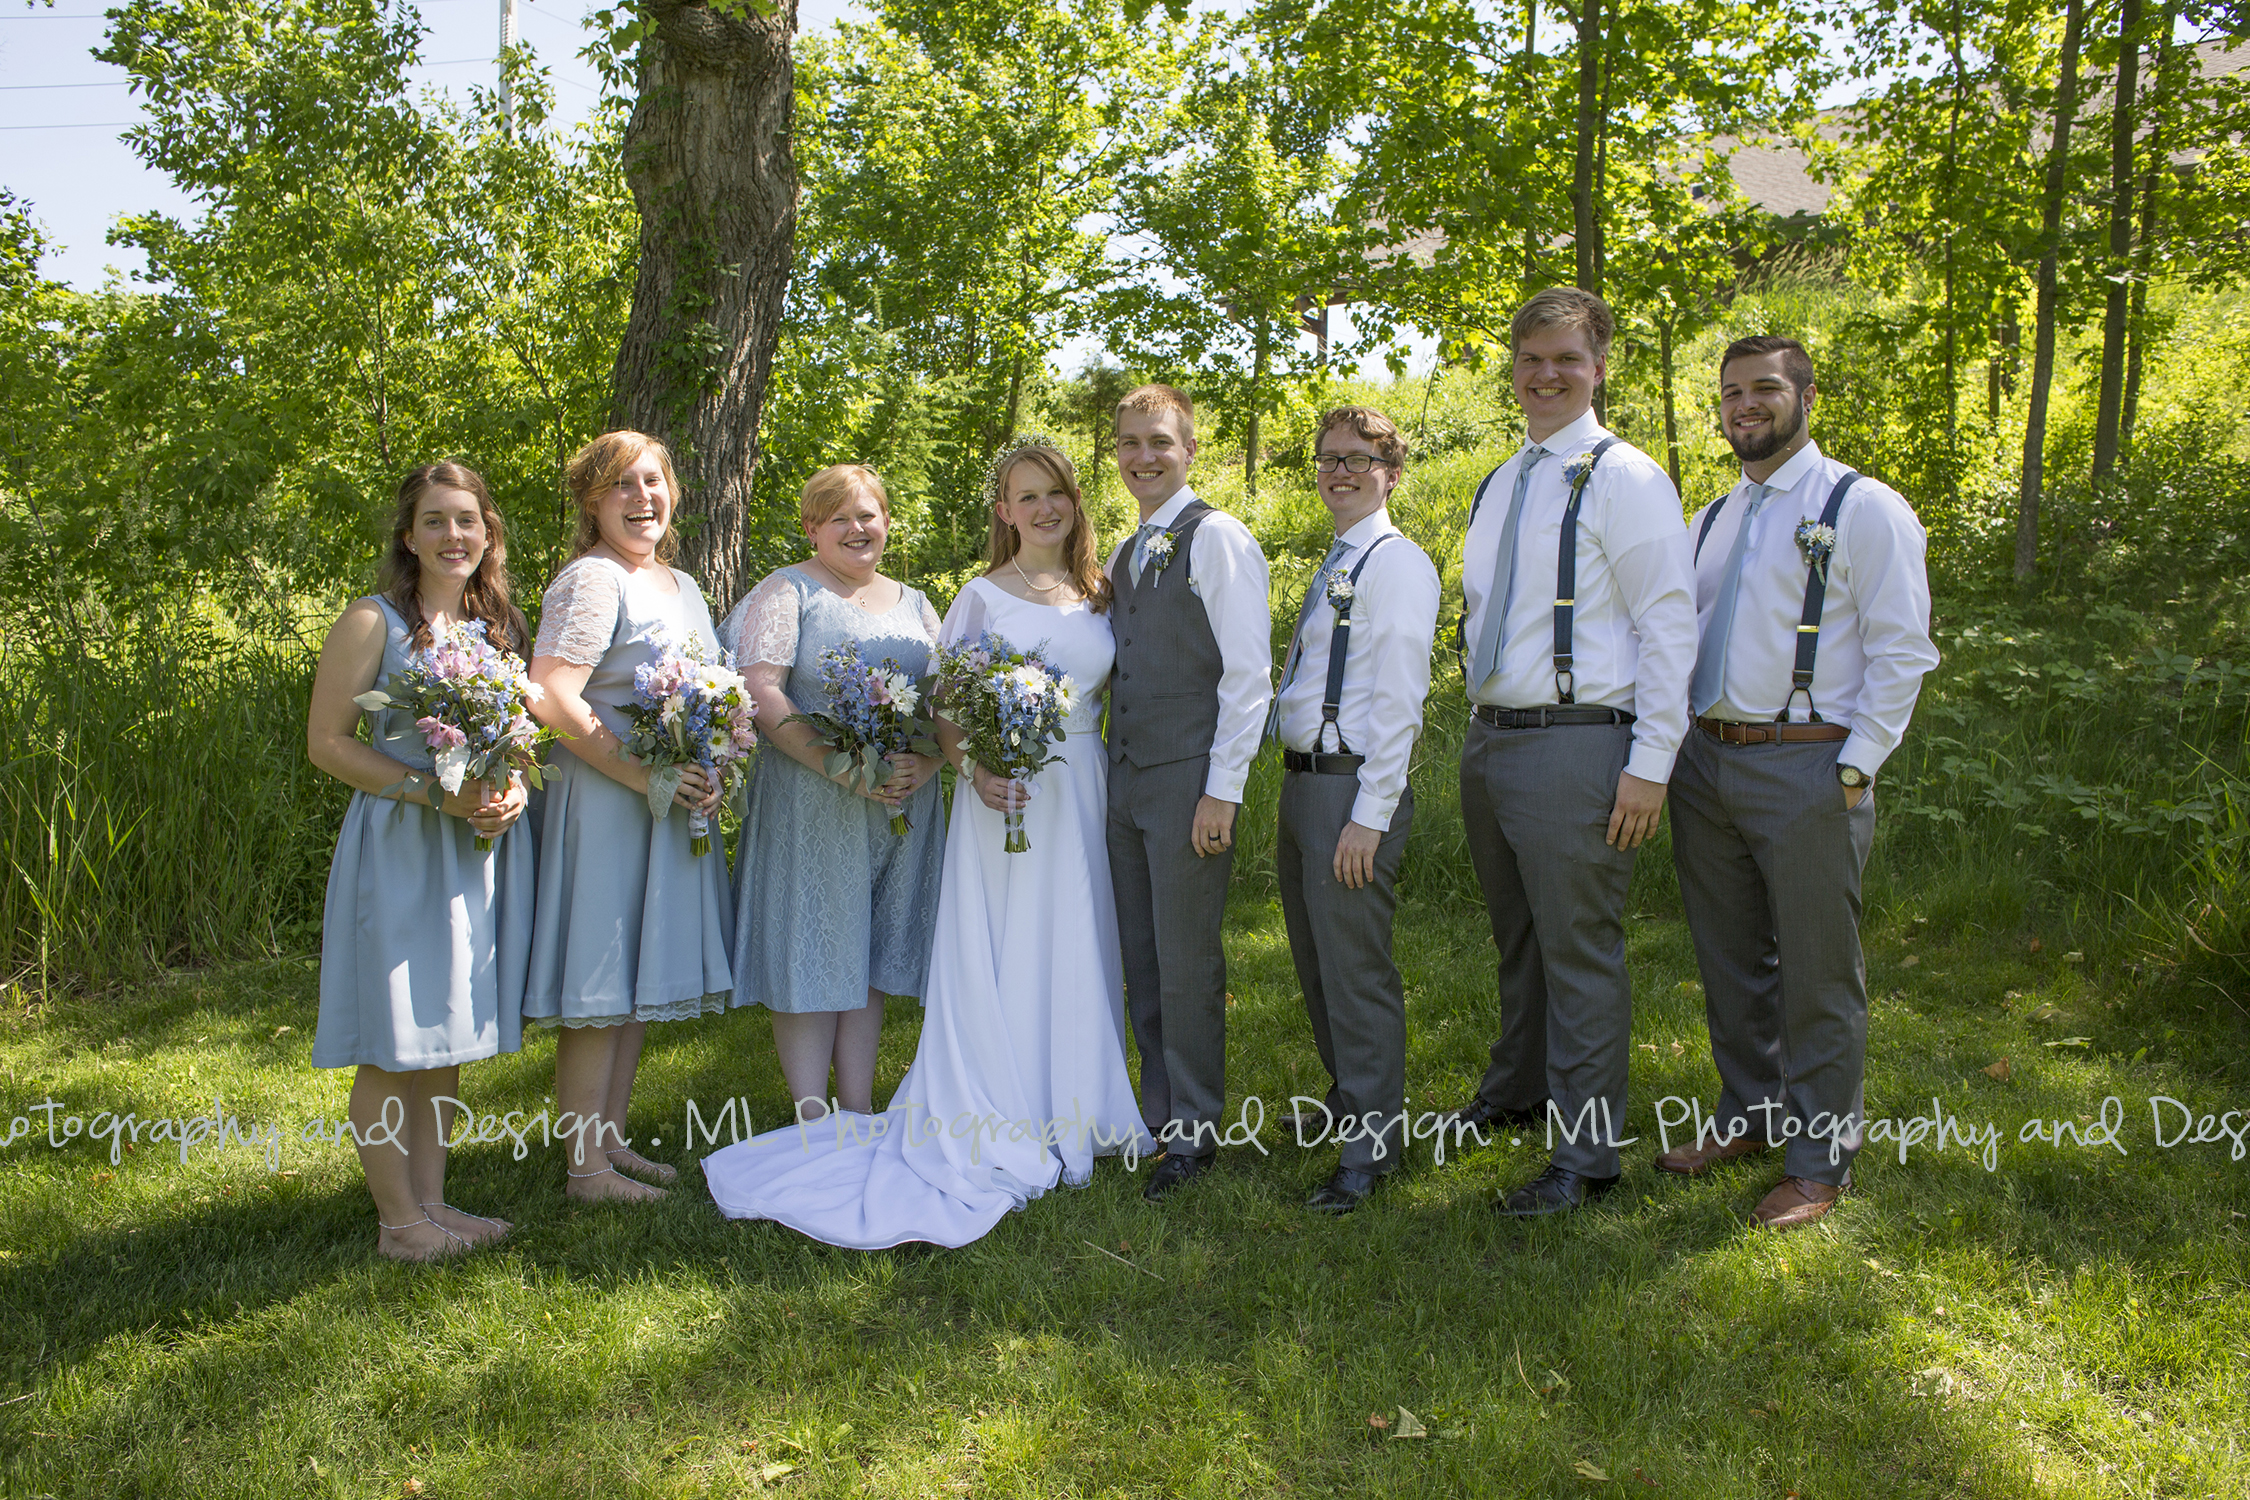 Lac-Lawrann-Conservancy-Wedding-29.jpg